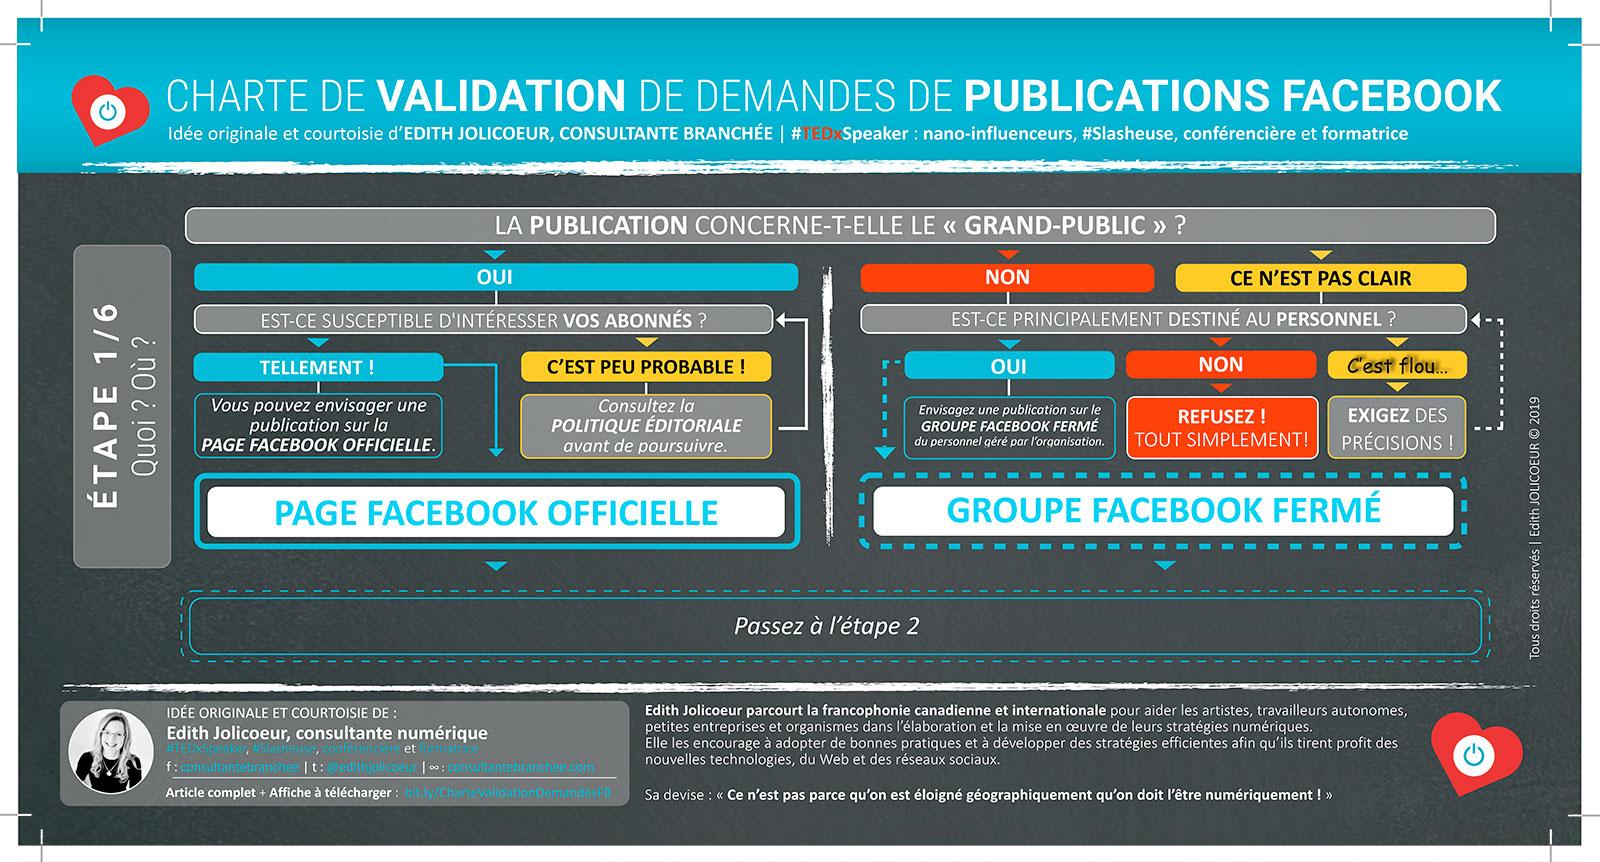 Étape 1 CHARTE DE VALIDATION de demandes de publications Facebook | Edith JOLICOEUR, consultante branchée